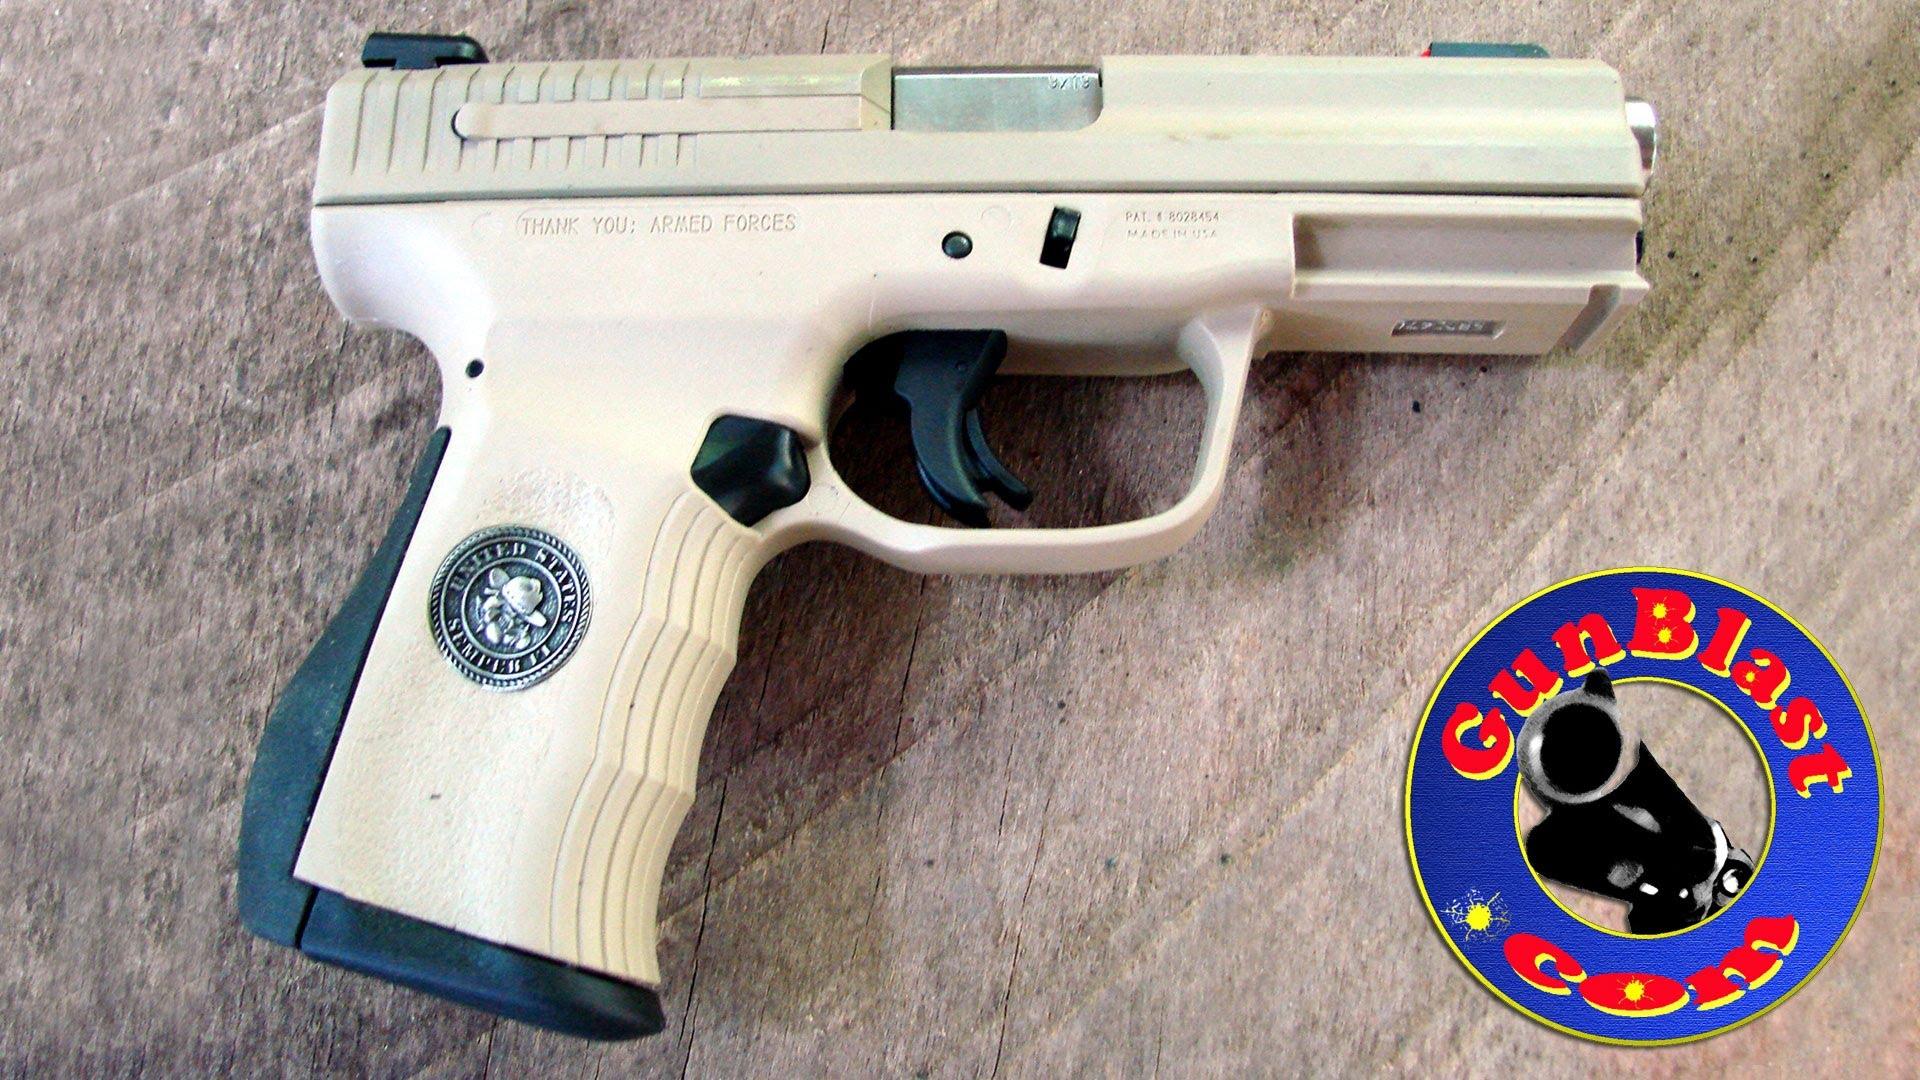 FMK 9C1 G2 Compact 9mm Pistol